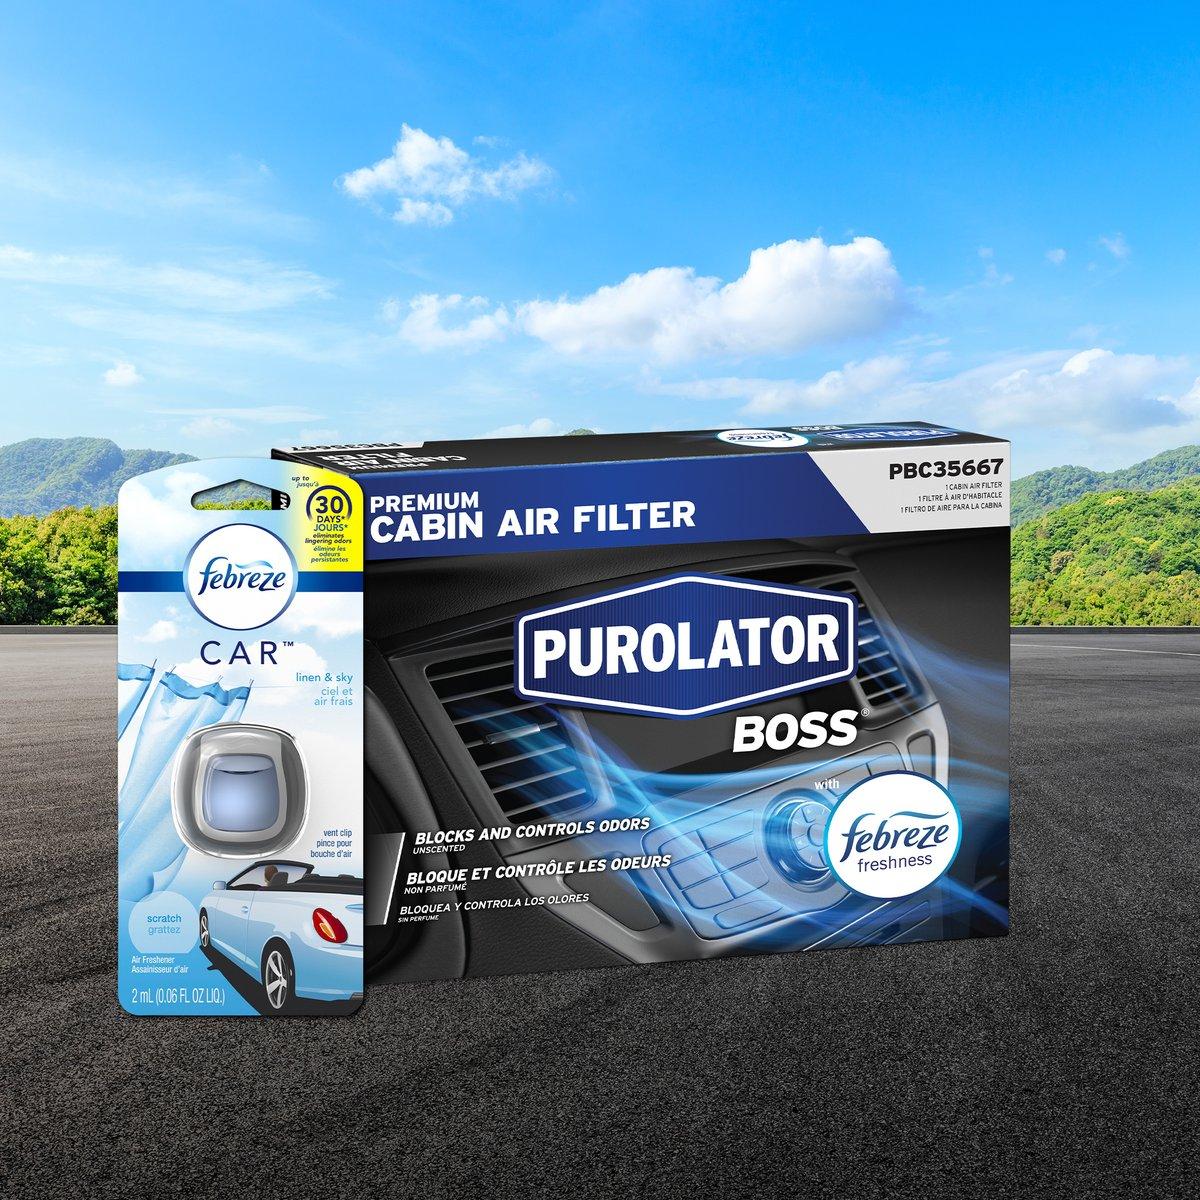 Febreze for #Free? Yep. Buy ANY PurolatorBOSS® Premium Cabin Air Filter from Advance Auto Parts. Get a FREE #Febreze Car Air Freshener. https://t.co/vPWsmGx52Z https://t.co/9J124S87rf